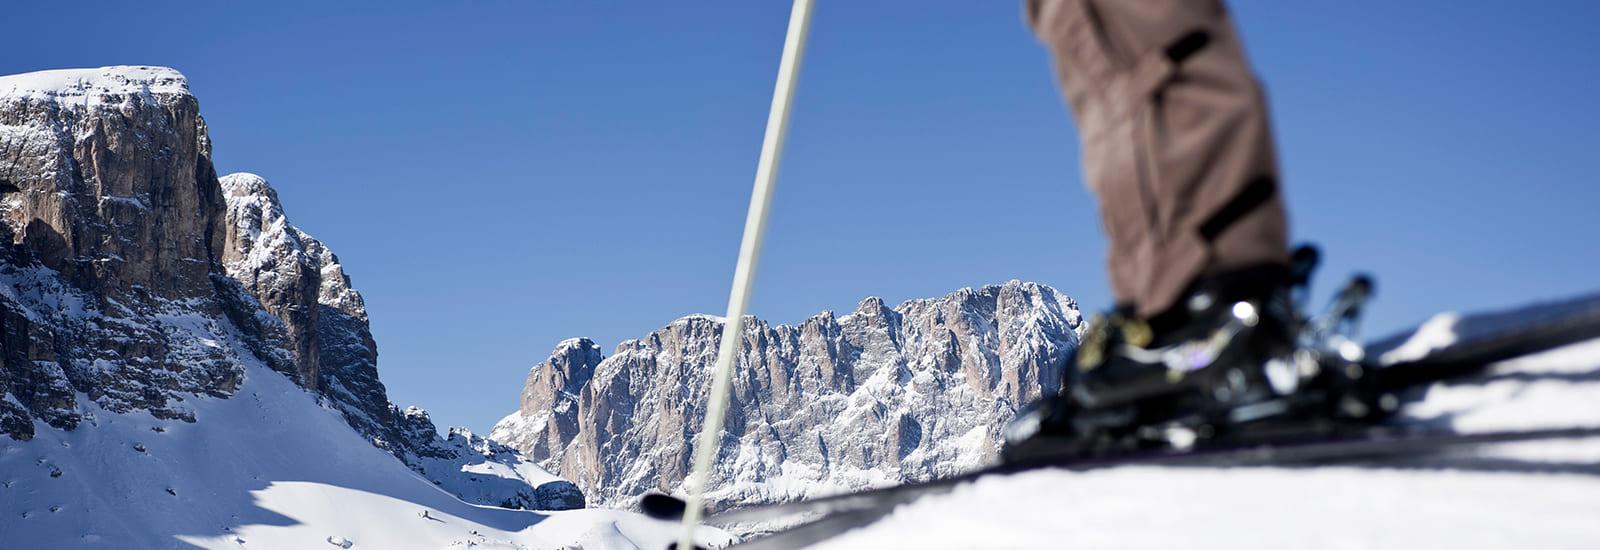 Antermejes Chalet | Winter in den Dolomiten